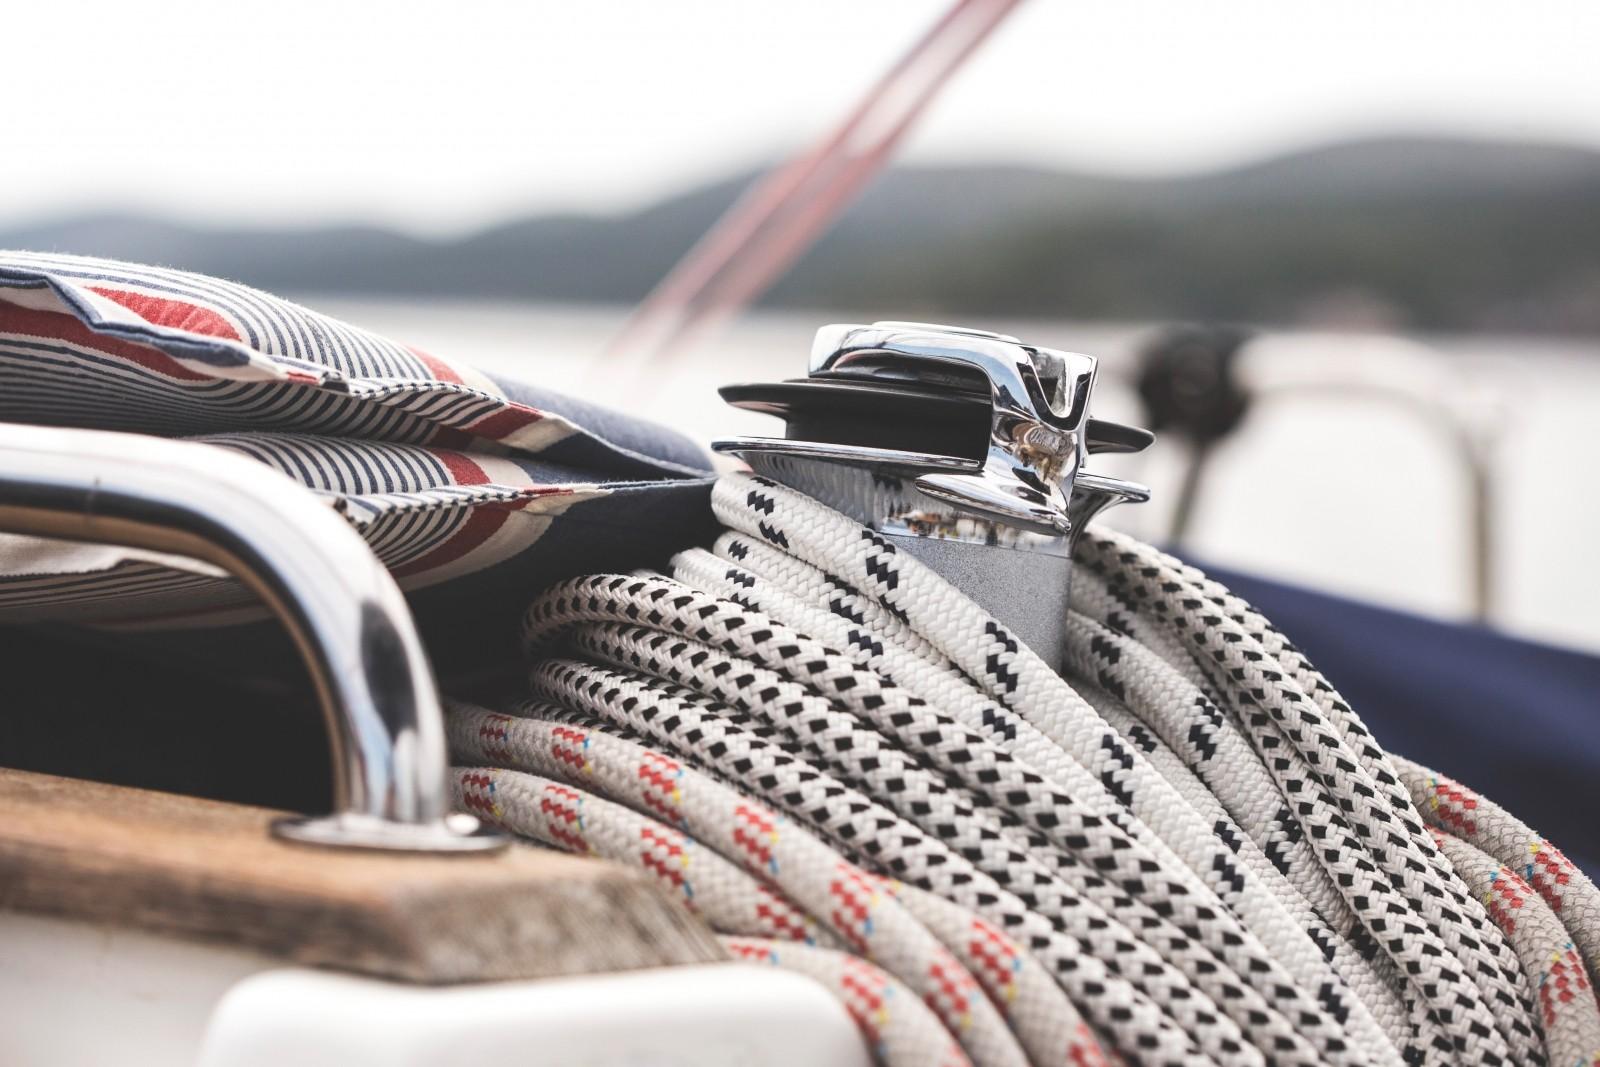 rope-boat-sailing-sailboat-detail-nautical-marine